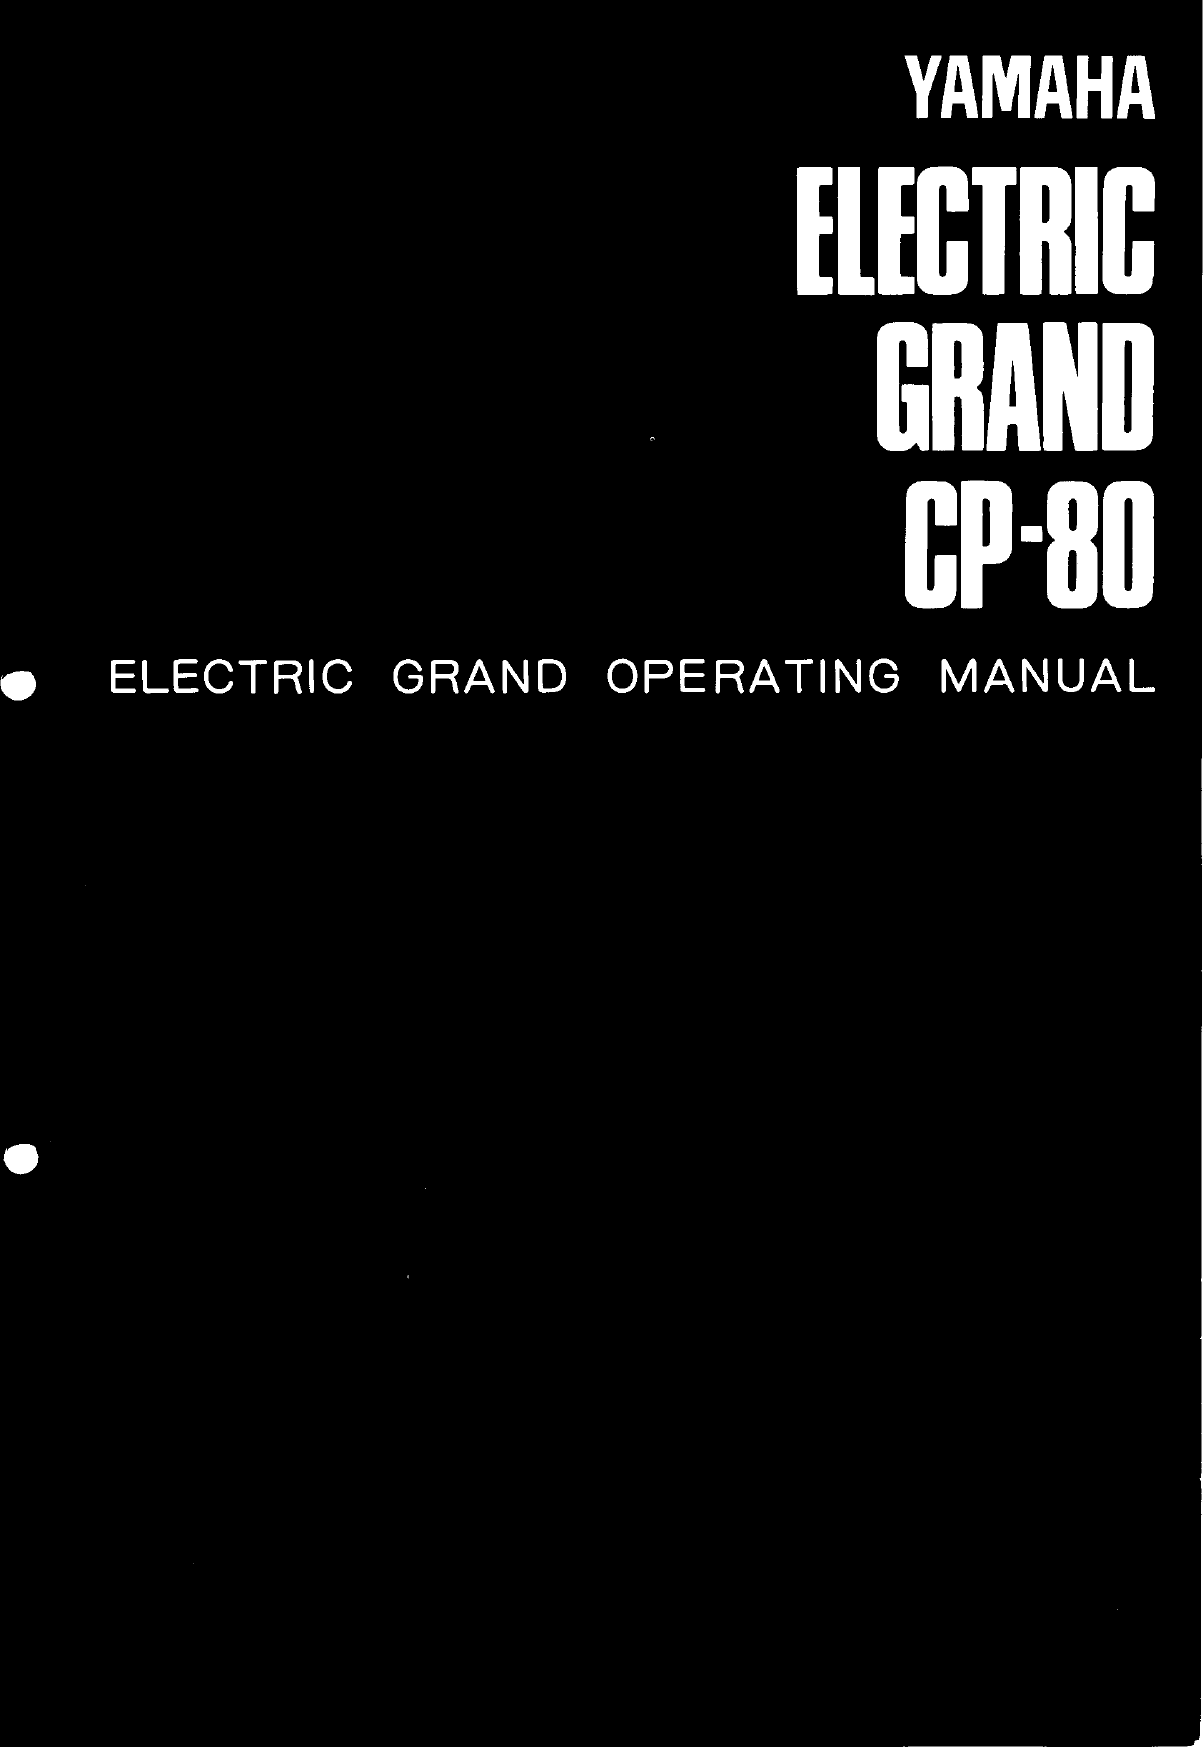 yamaha cp 80 owner s manual image cp80e rh usermanual wiki yamaha cp 80 manual Yamaha Electric Grand Piano